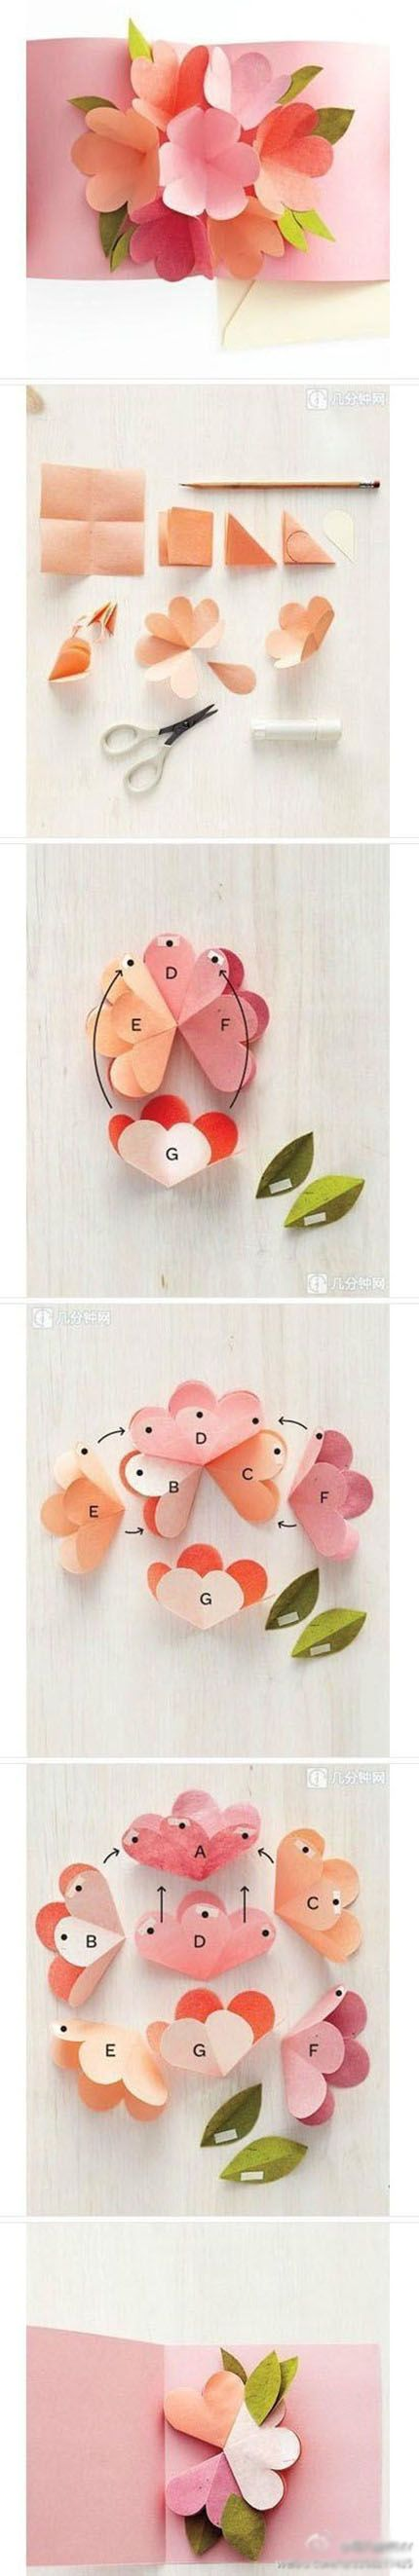 Diy Beautiful Flowers | DIY & Crafts